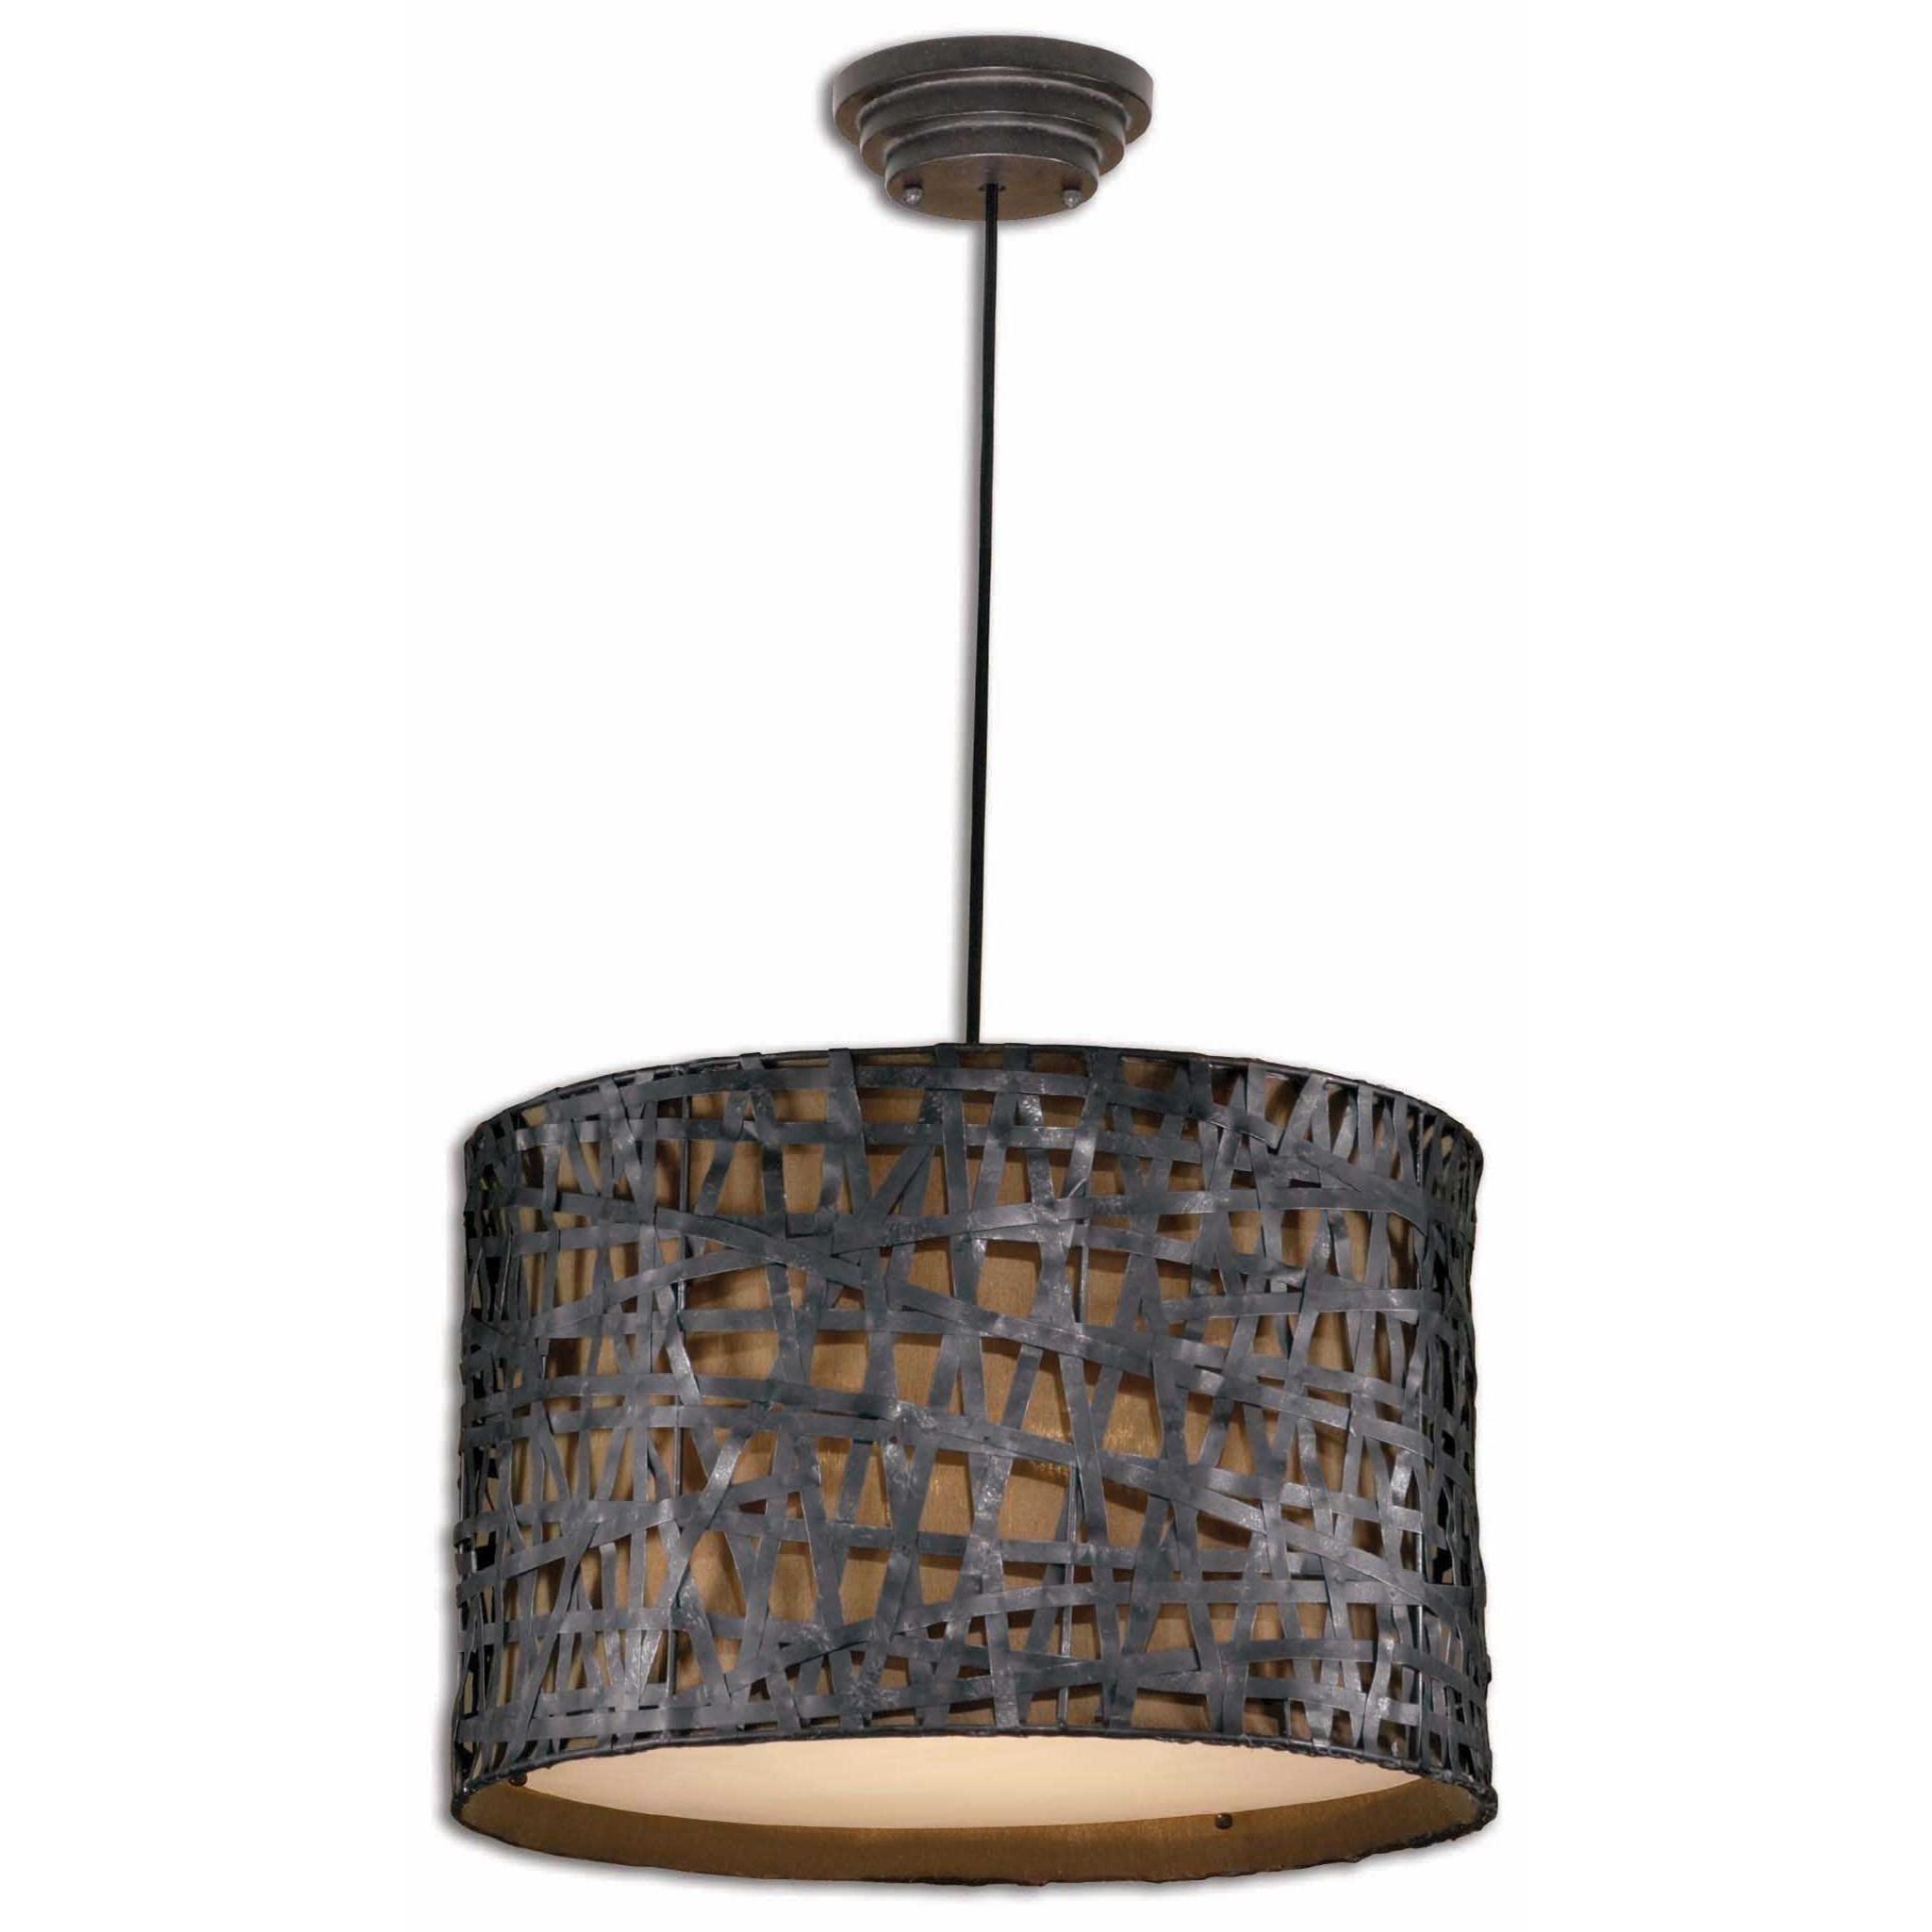 Lighting Fixtures - Pendant Lights Alita 3 Light Metal Pendant by Uttermost at Mueller Furniture